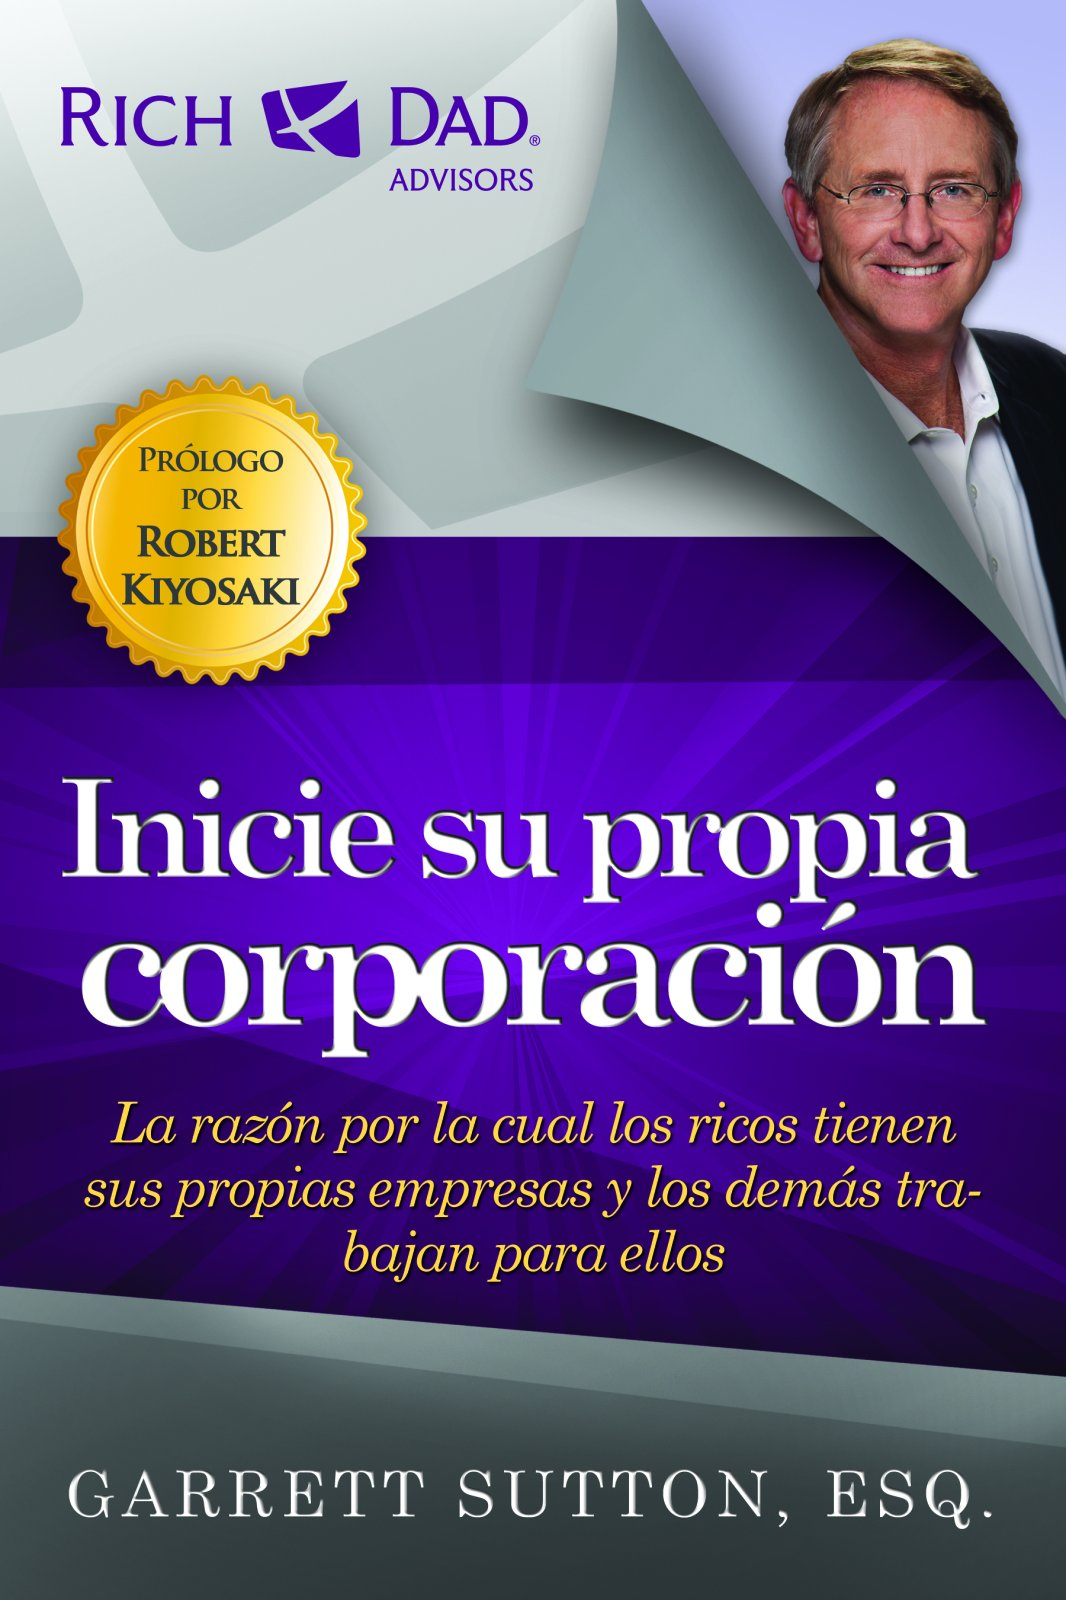 Inicie su propia corporacion (Spanish Edition)